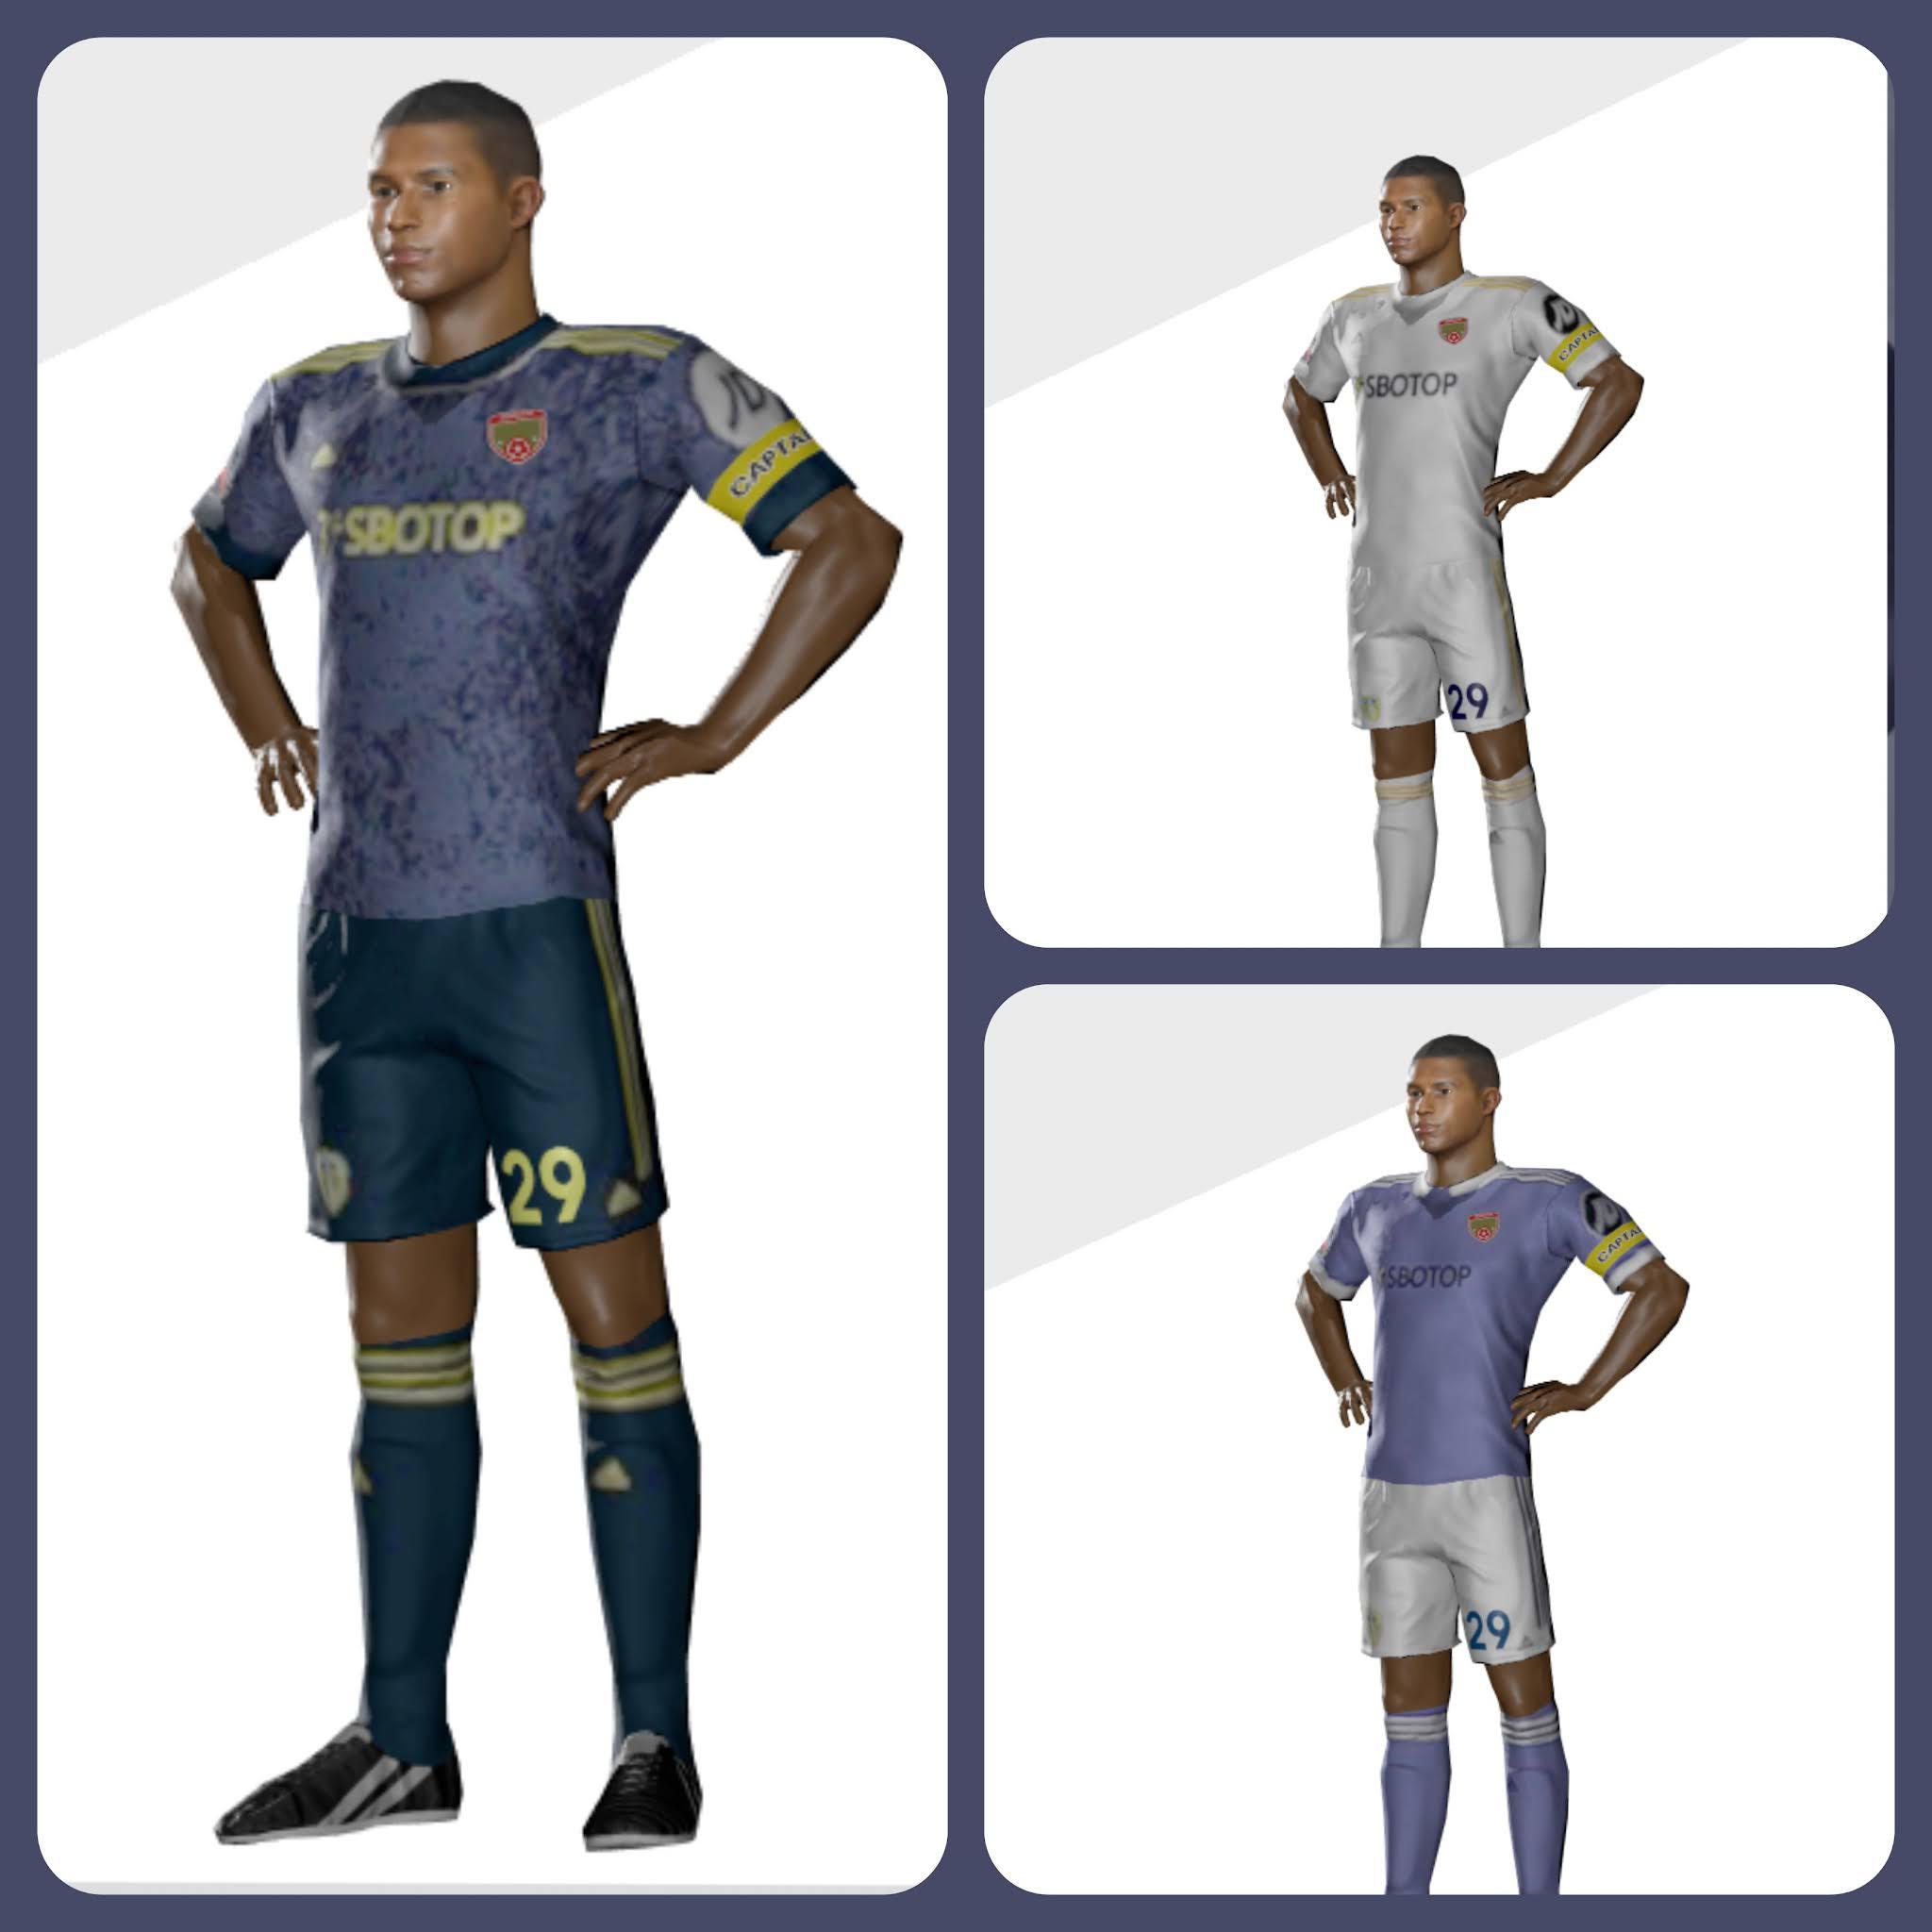 Kit leeds united dream league soccer